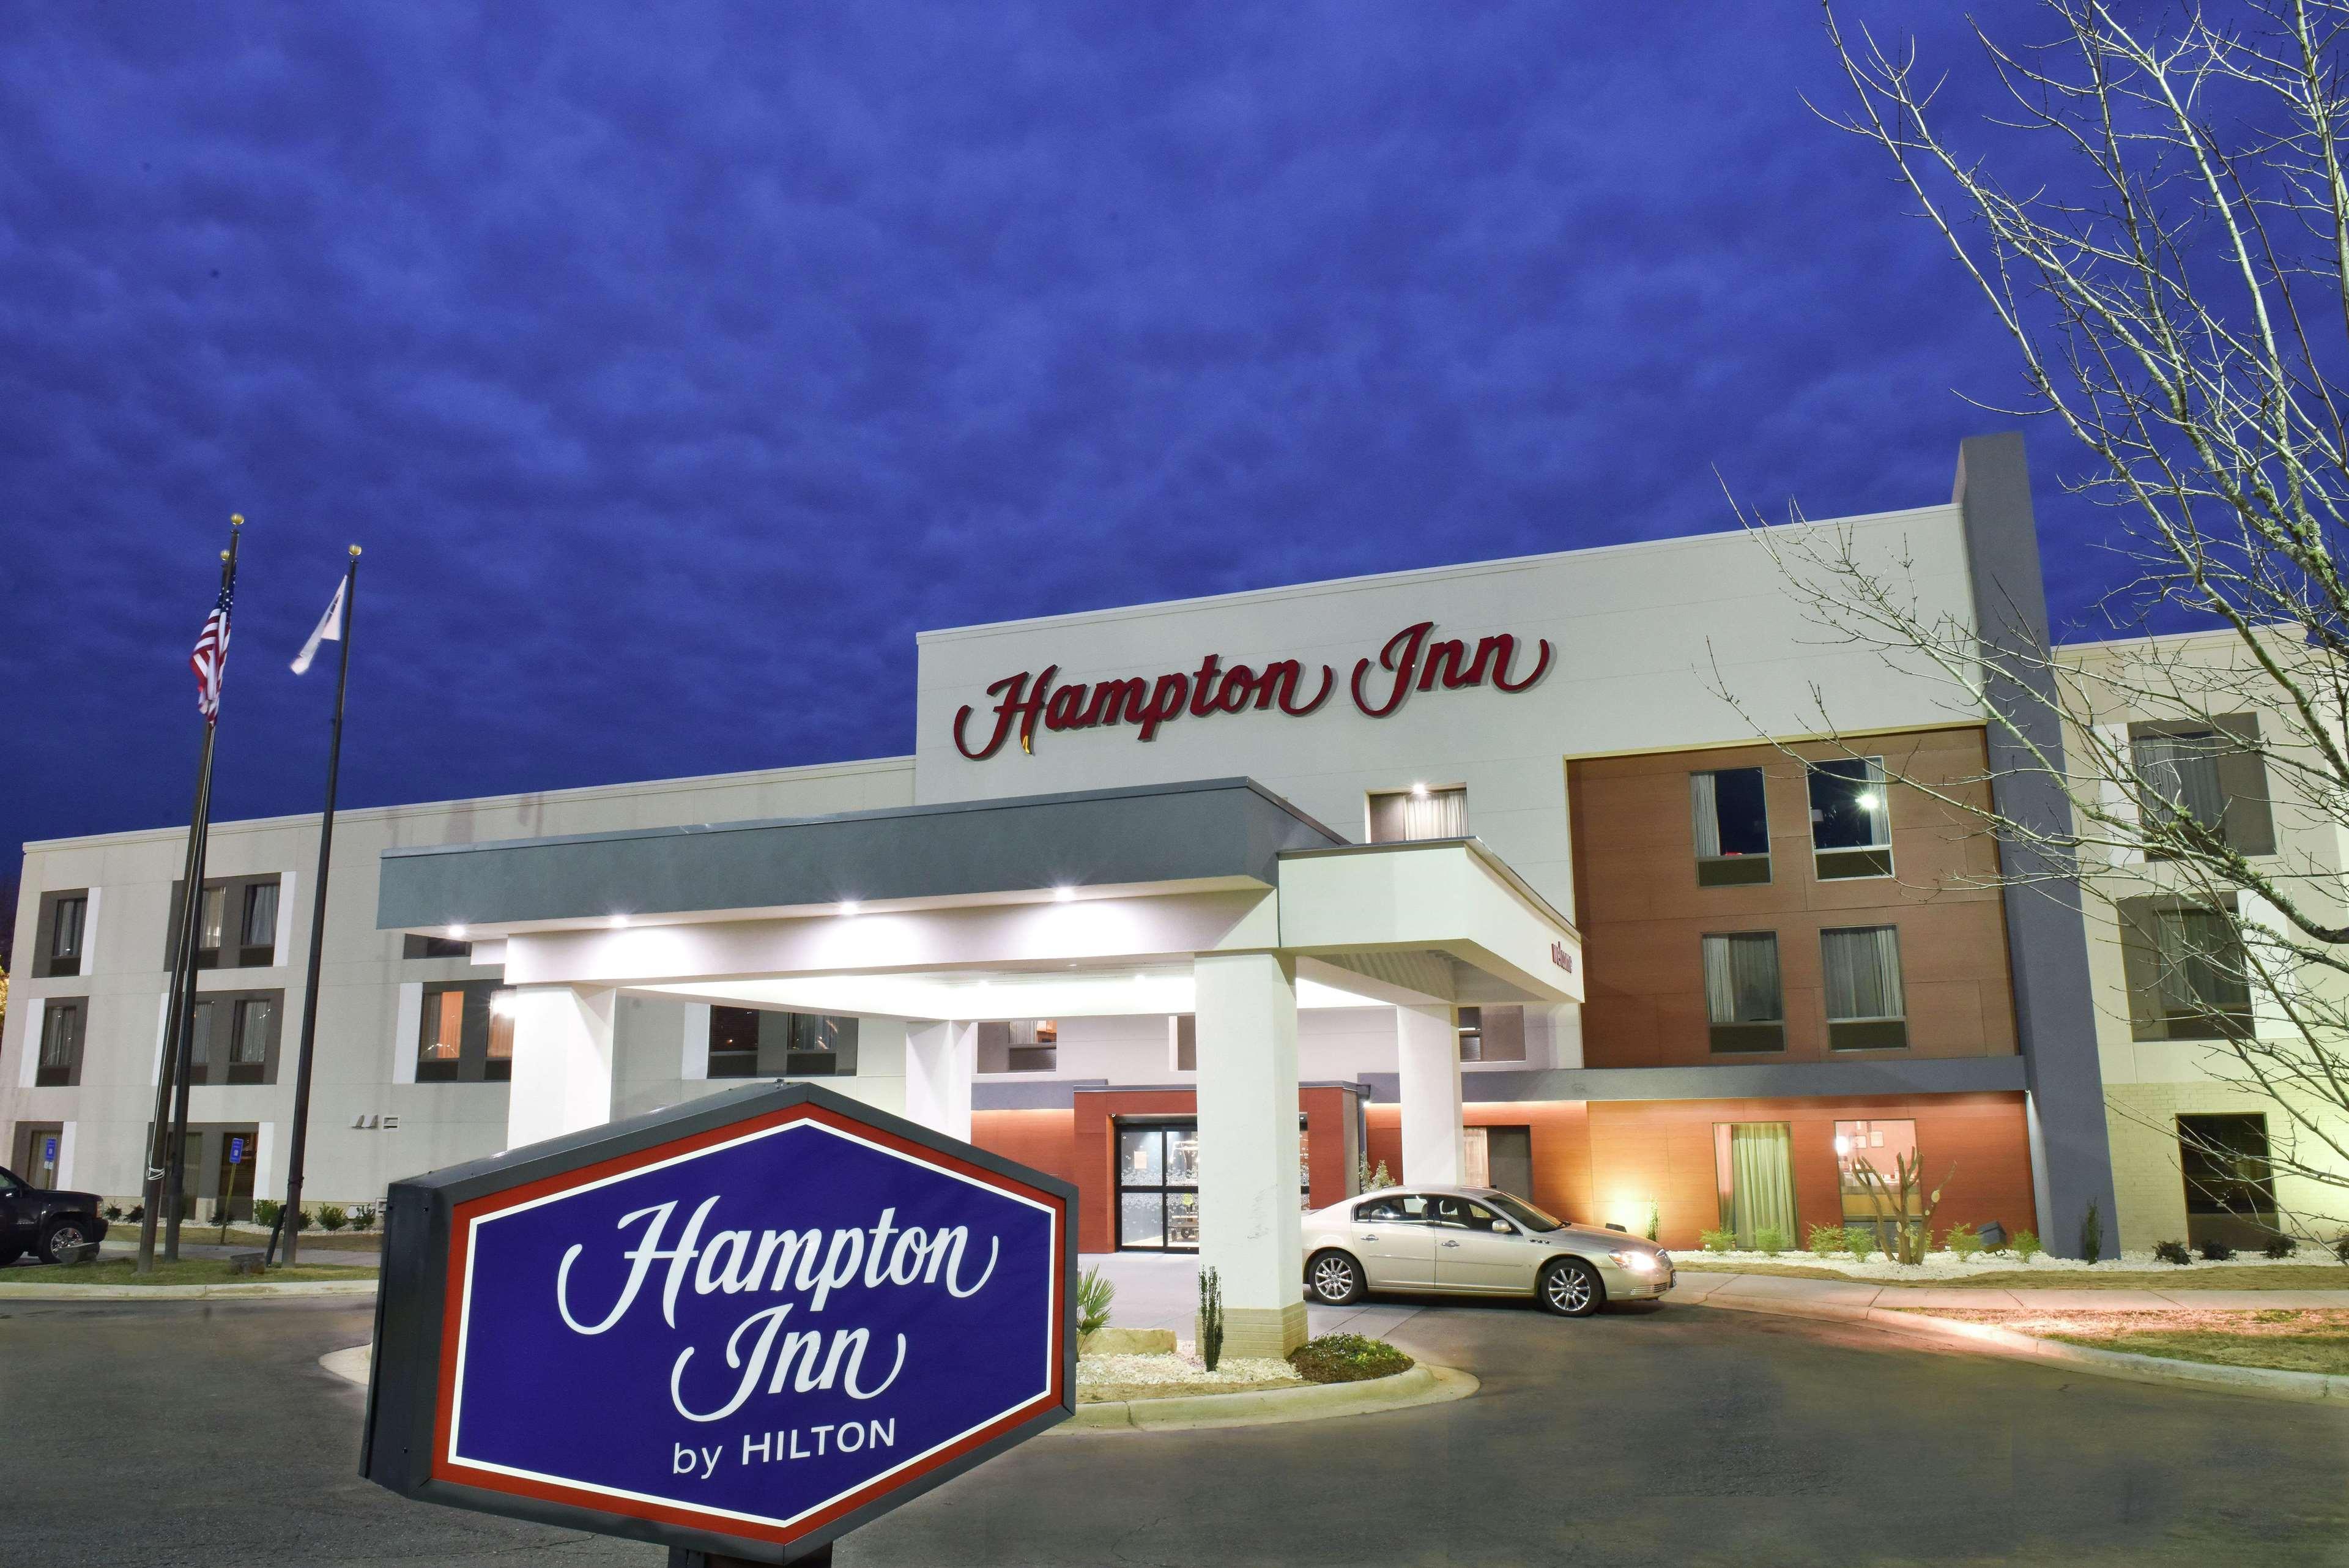 Hampton Inn Madison - Madison, GA 30650 - (706)342-9003 | ShowMeLocal.com